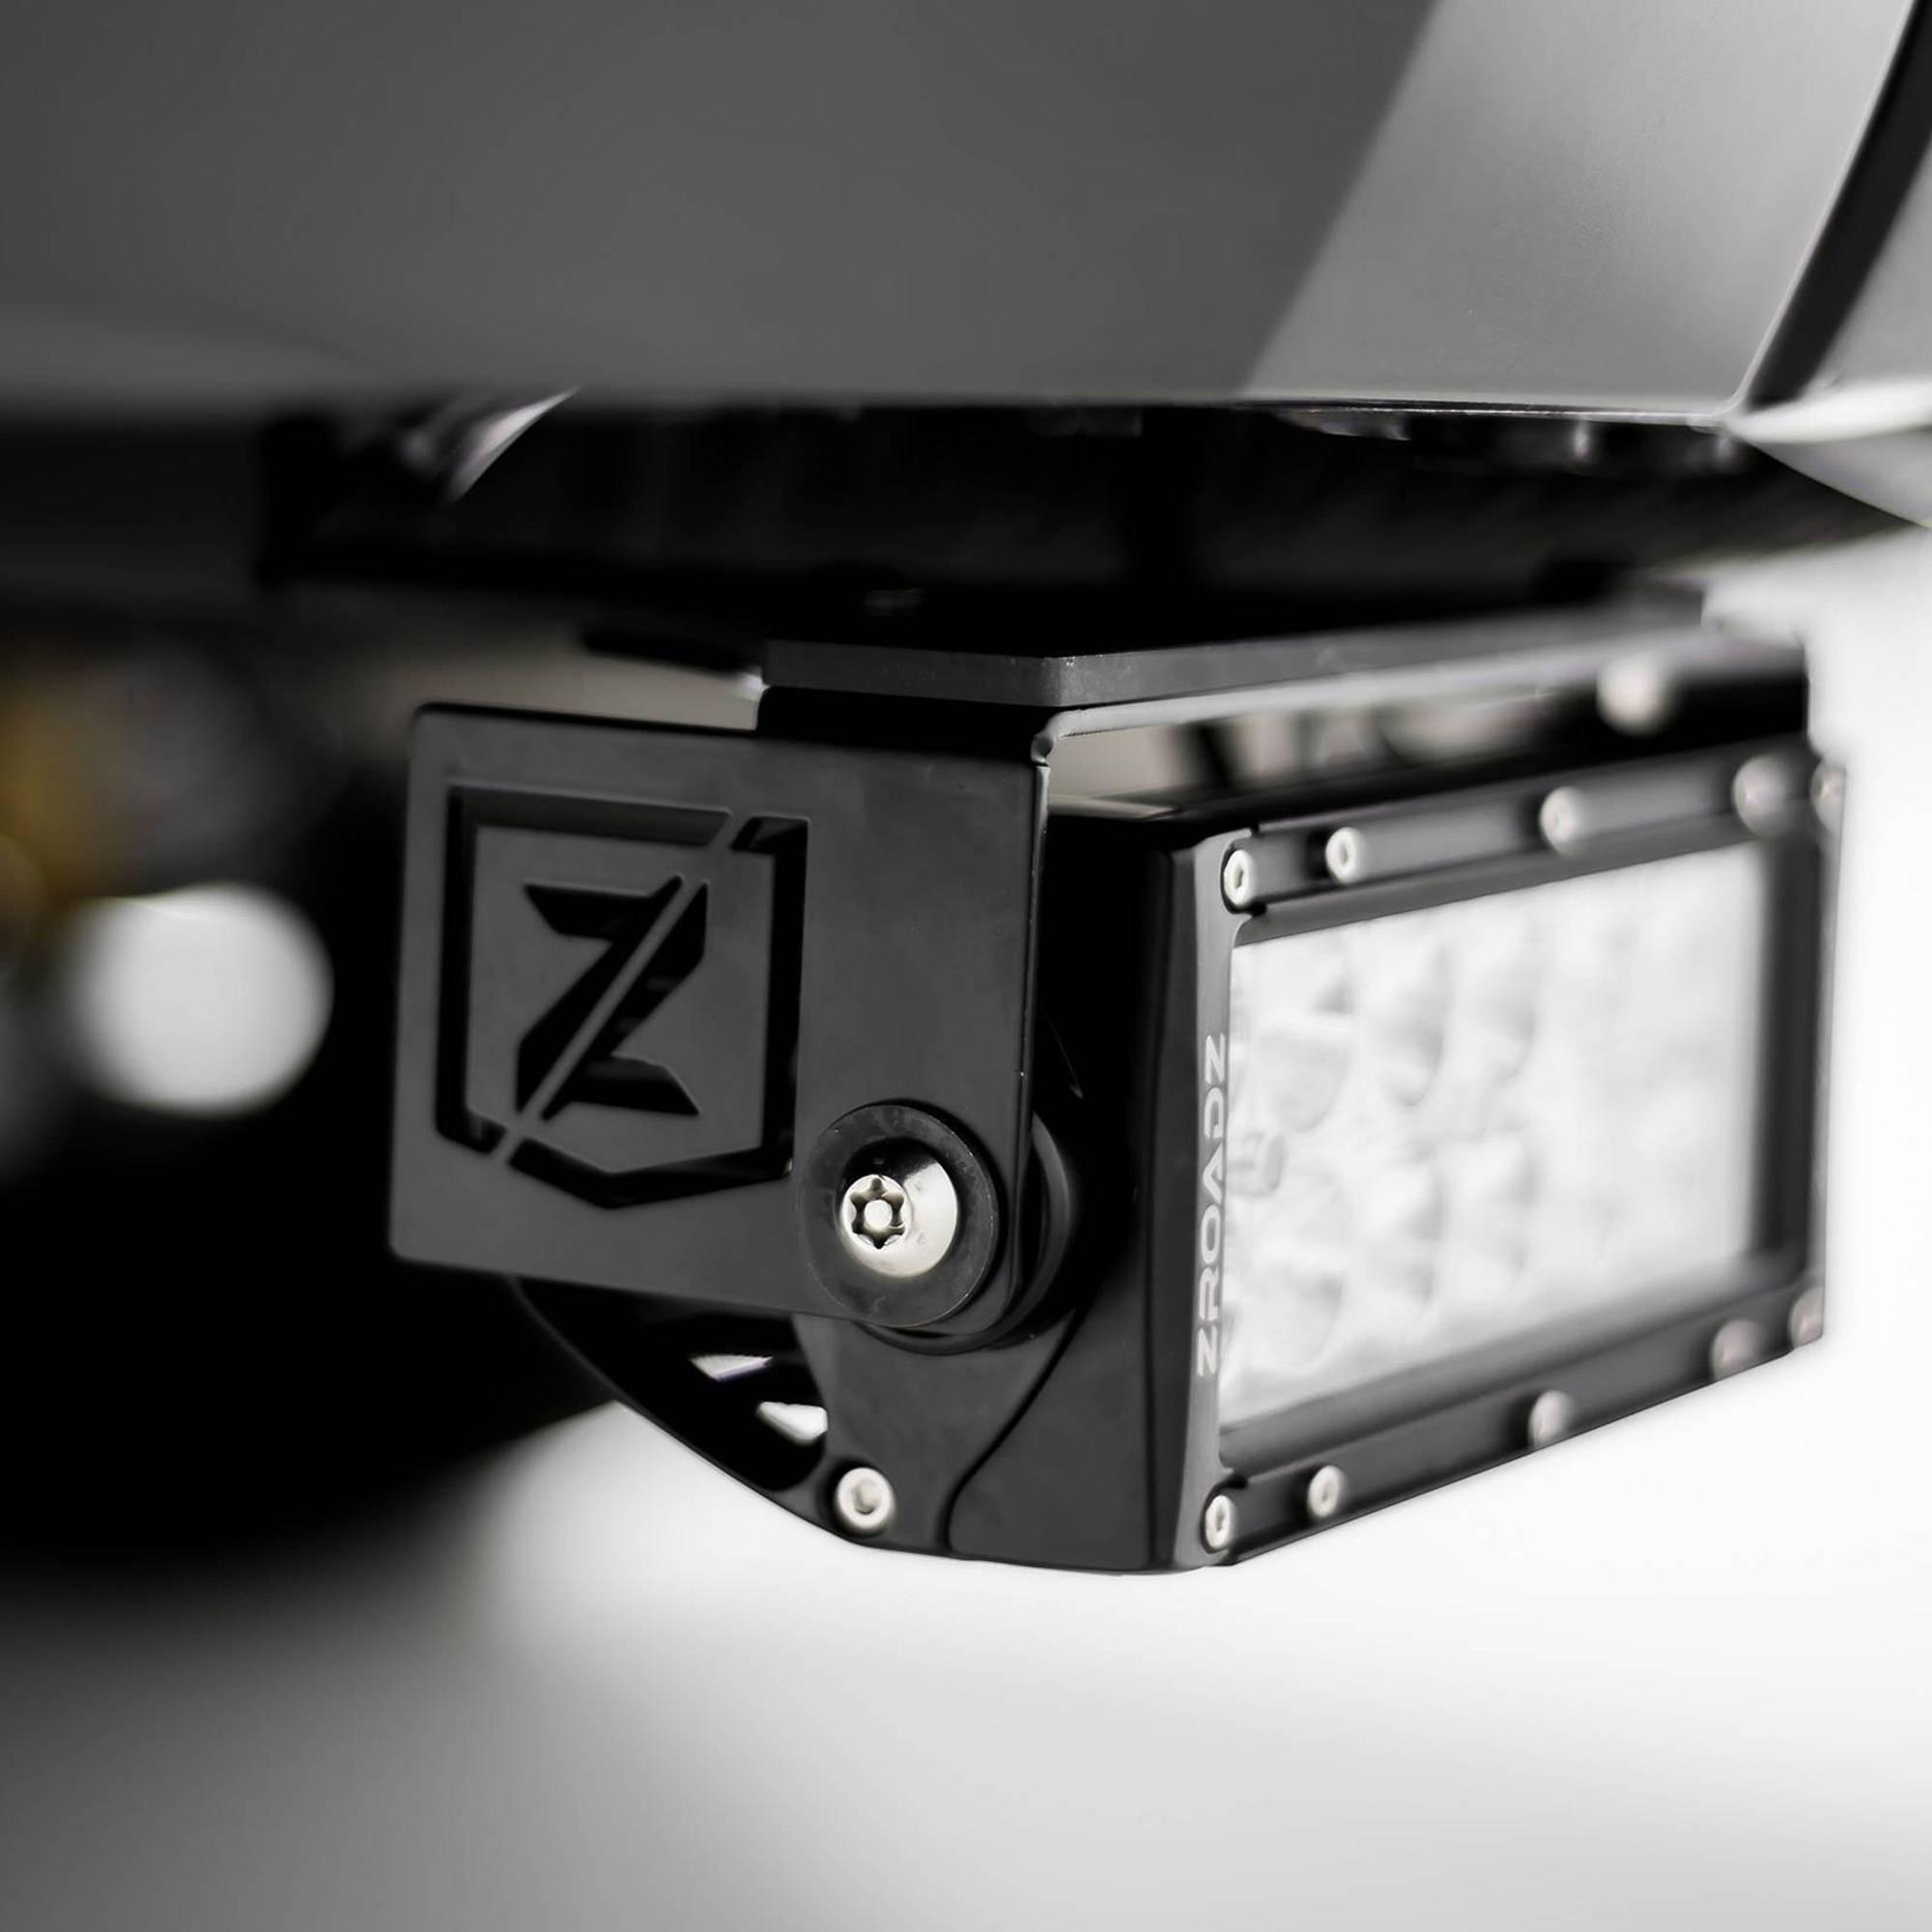 ZROADZ                                             - 2014-2021 Toyota Tundra Rear Bumper LED Kit with (2) 6 Inch LED Straight Double Row Light Bars - PN #Z389641-KIT